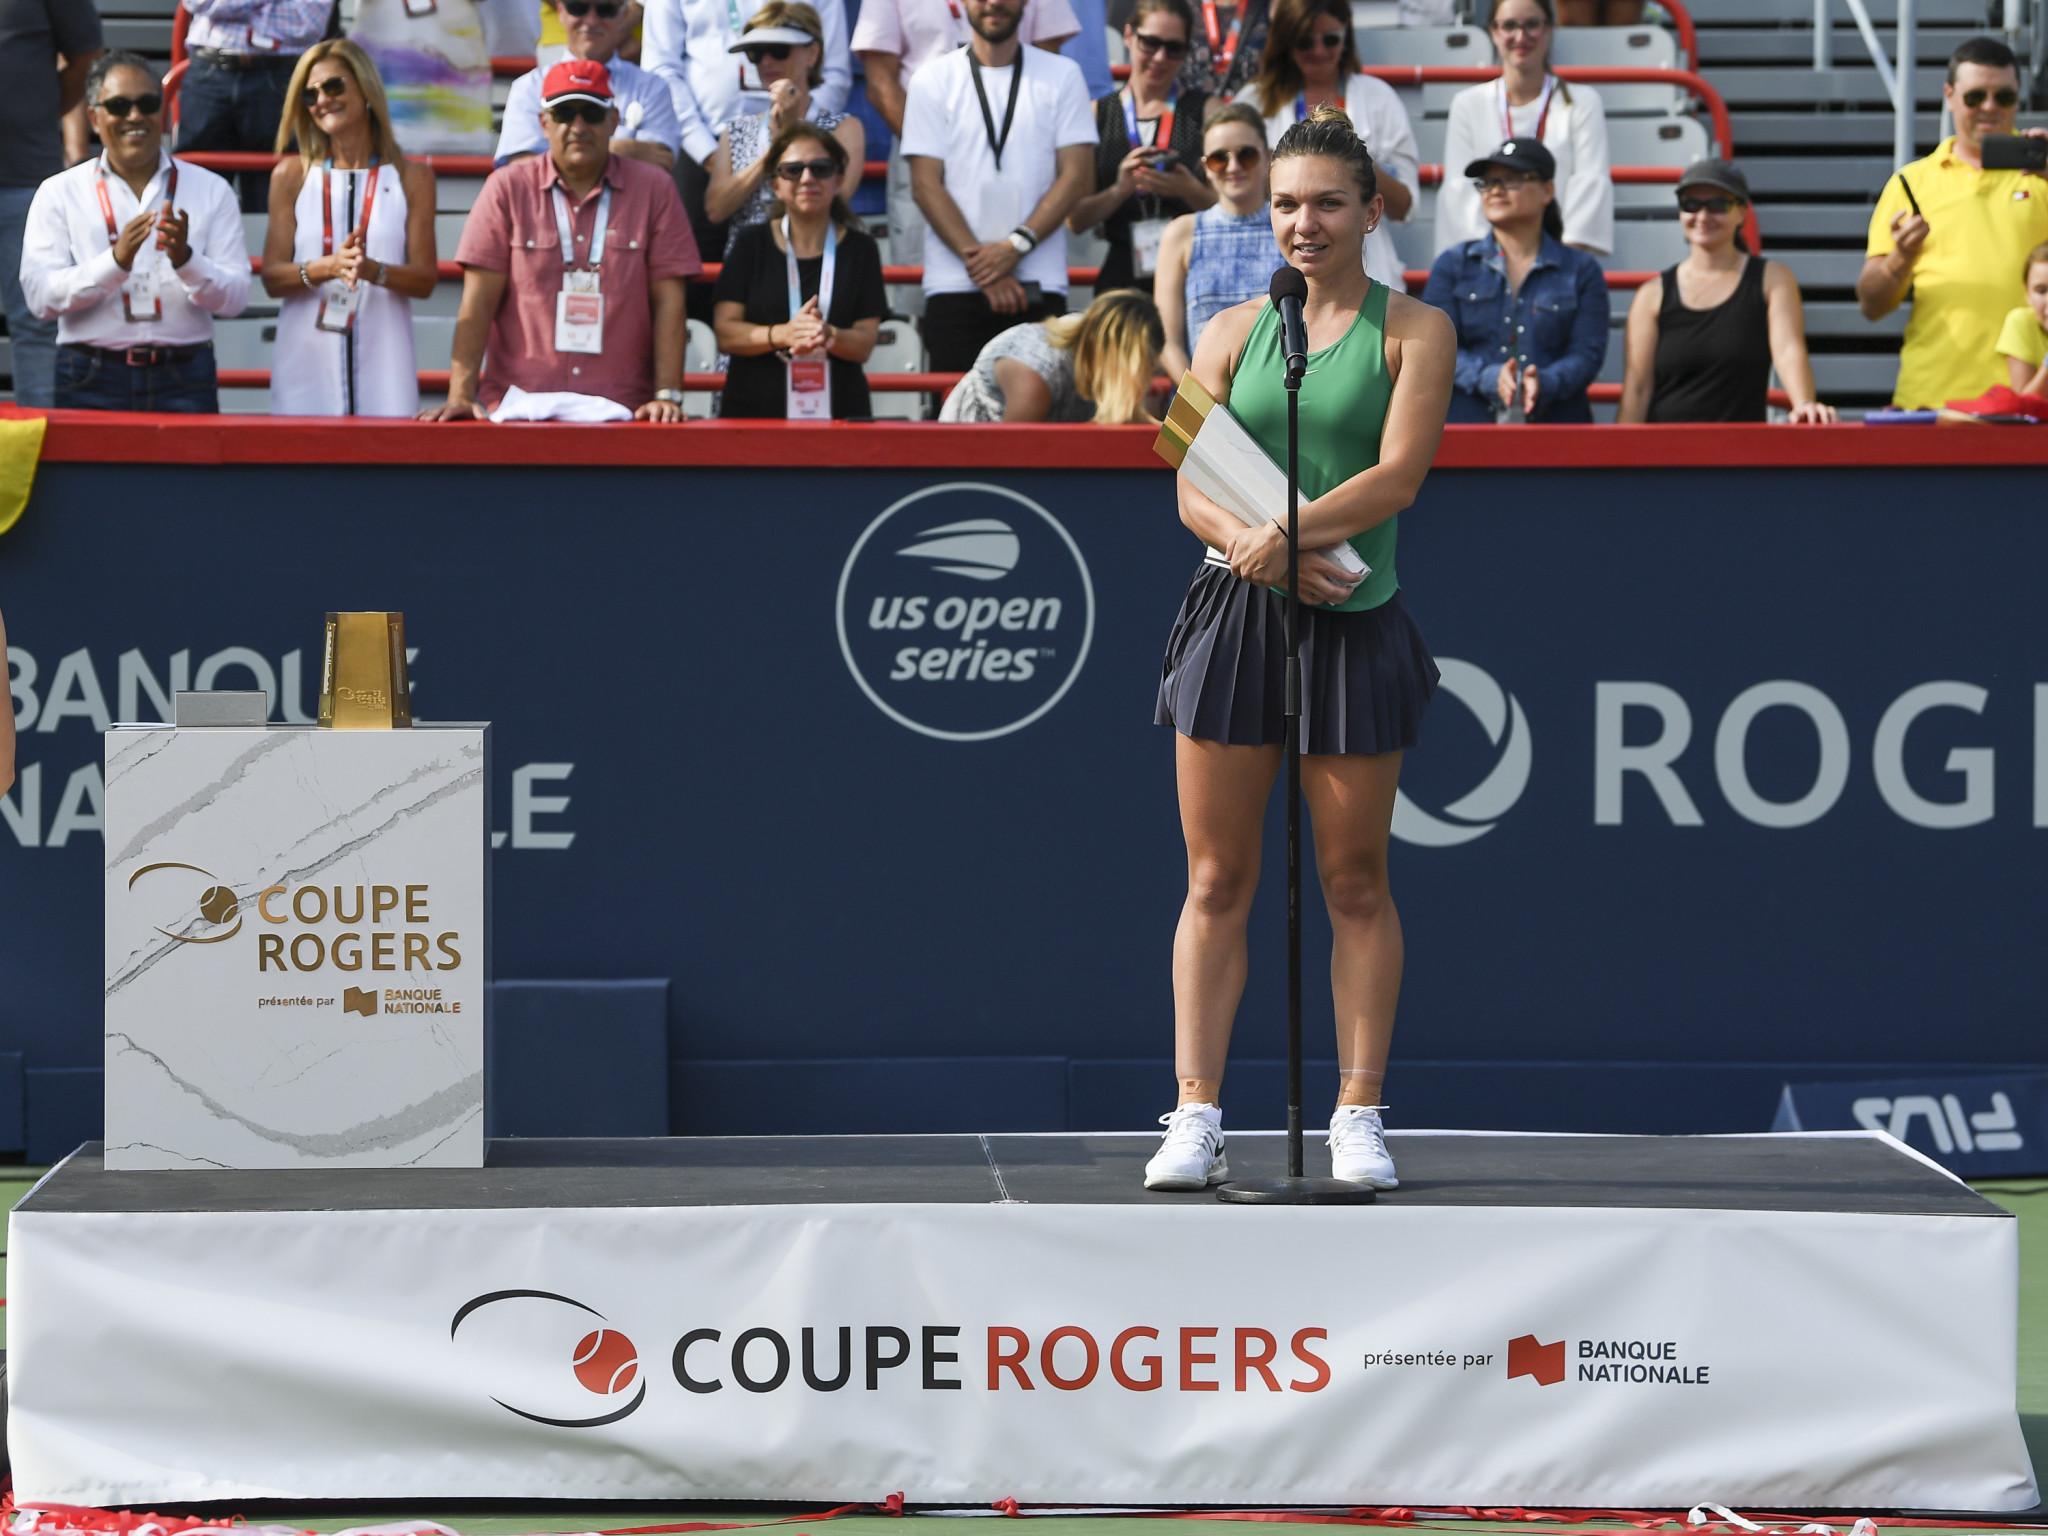 Tennis Canada make cuts amid losses over coronavirus pandemic